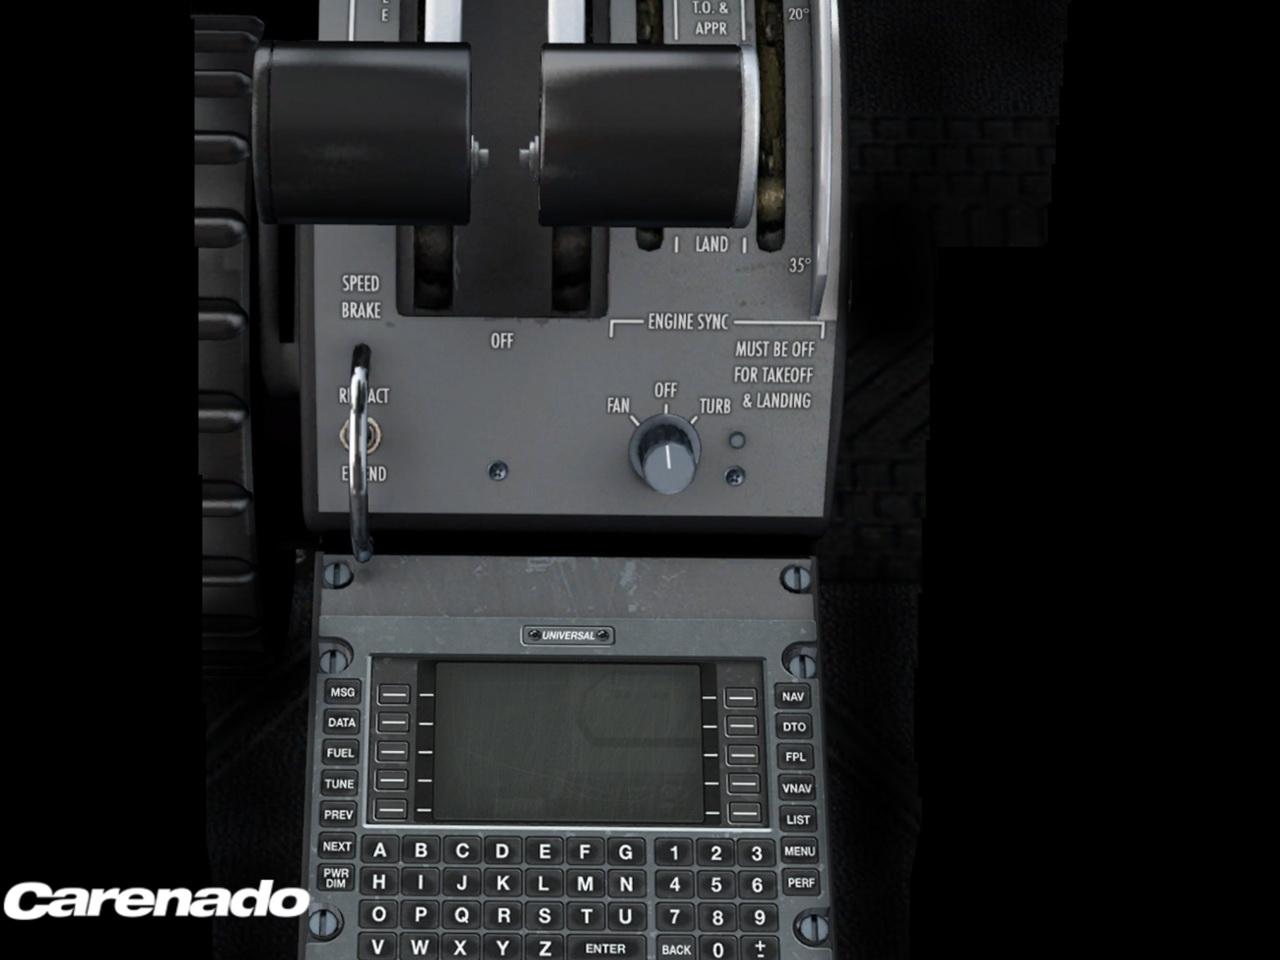 Carenado S550_3.jpg